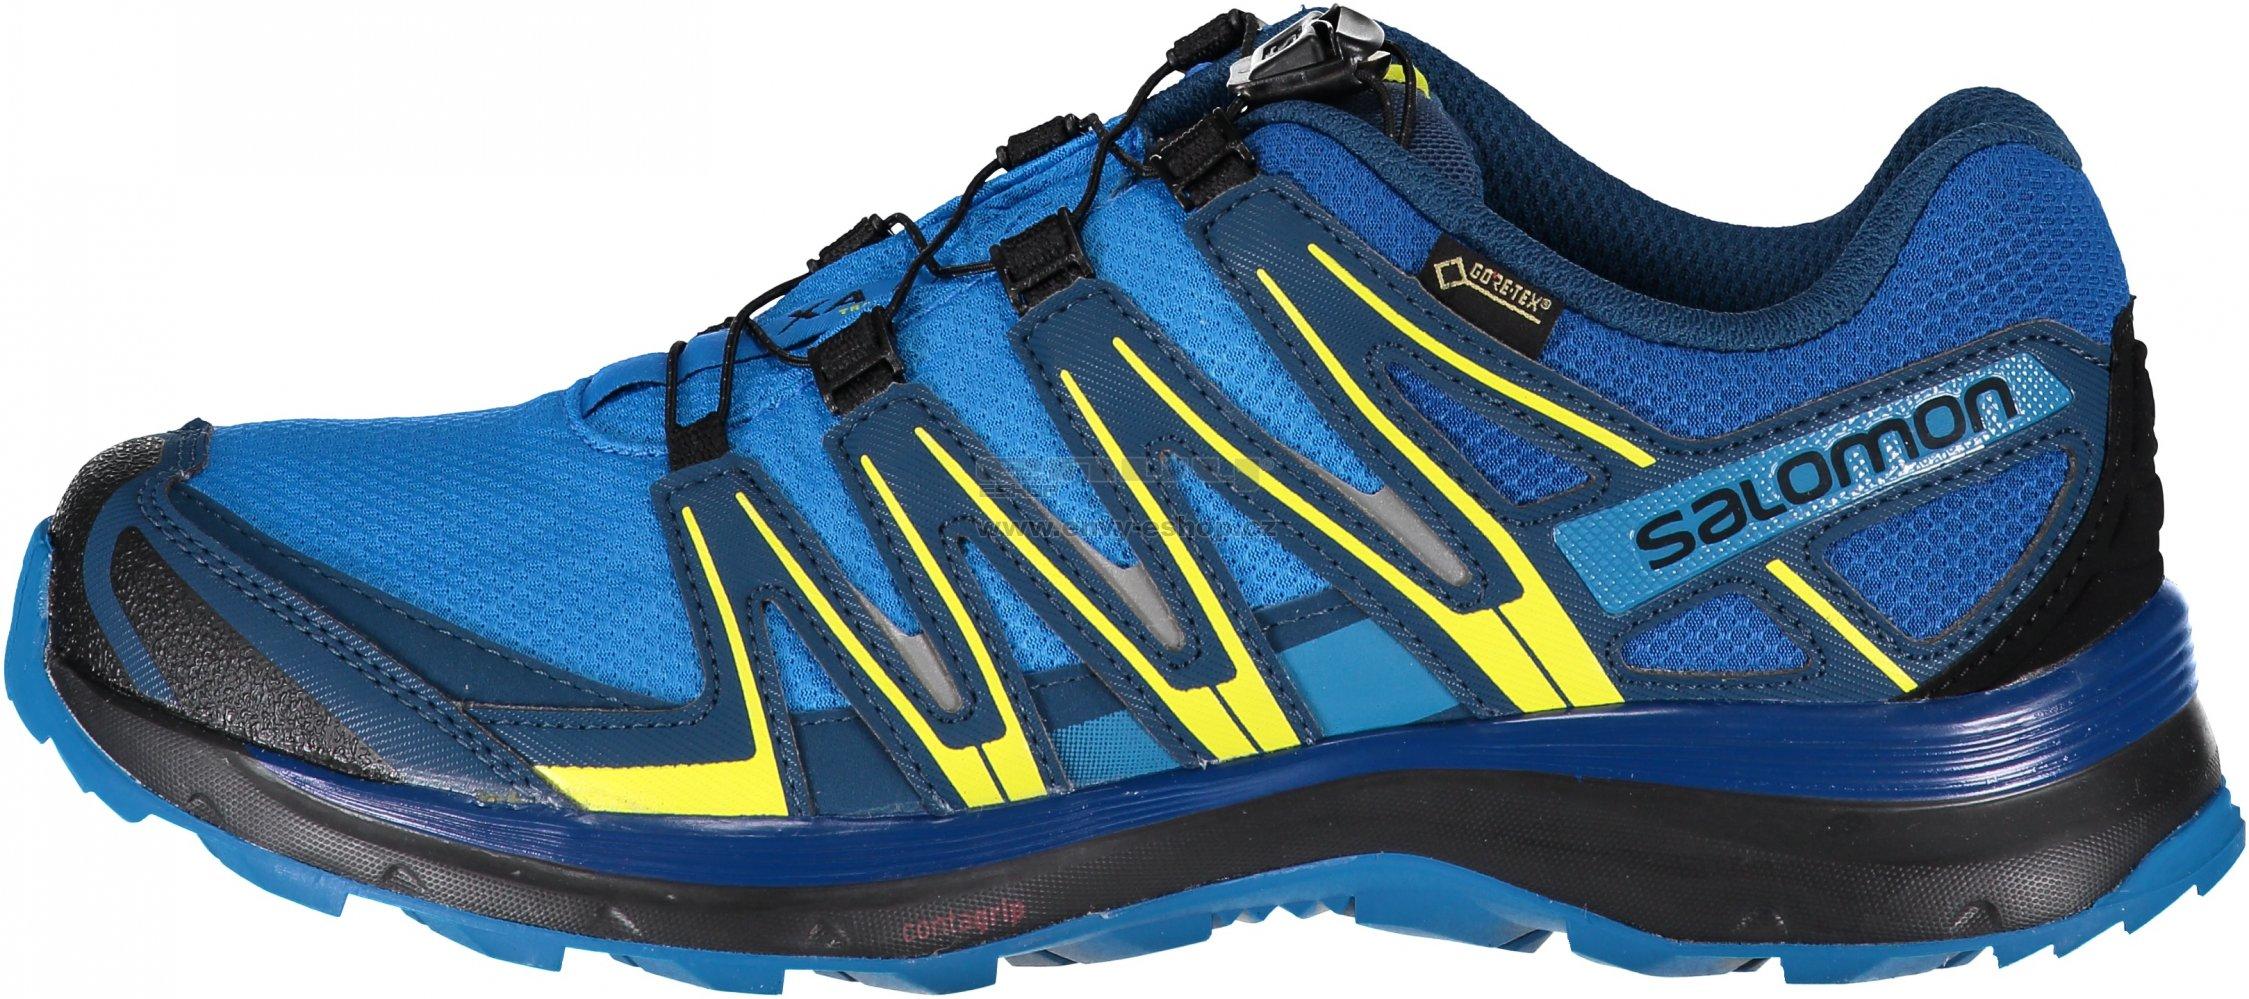 d0dc1a30479a Pánské sportovní boty SALOMON XA LITE GTX L40071300 INDIGO BUNTING SNORKEL  BLUE SULPHUR